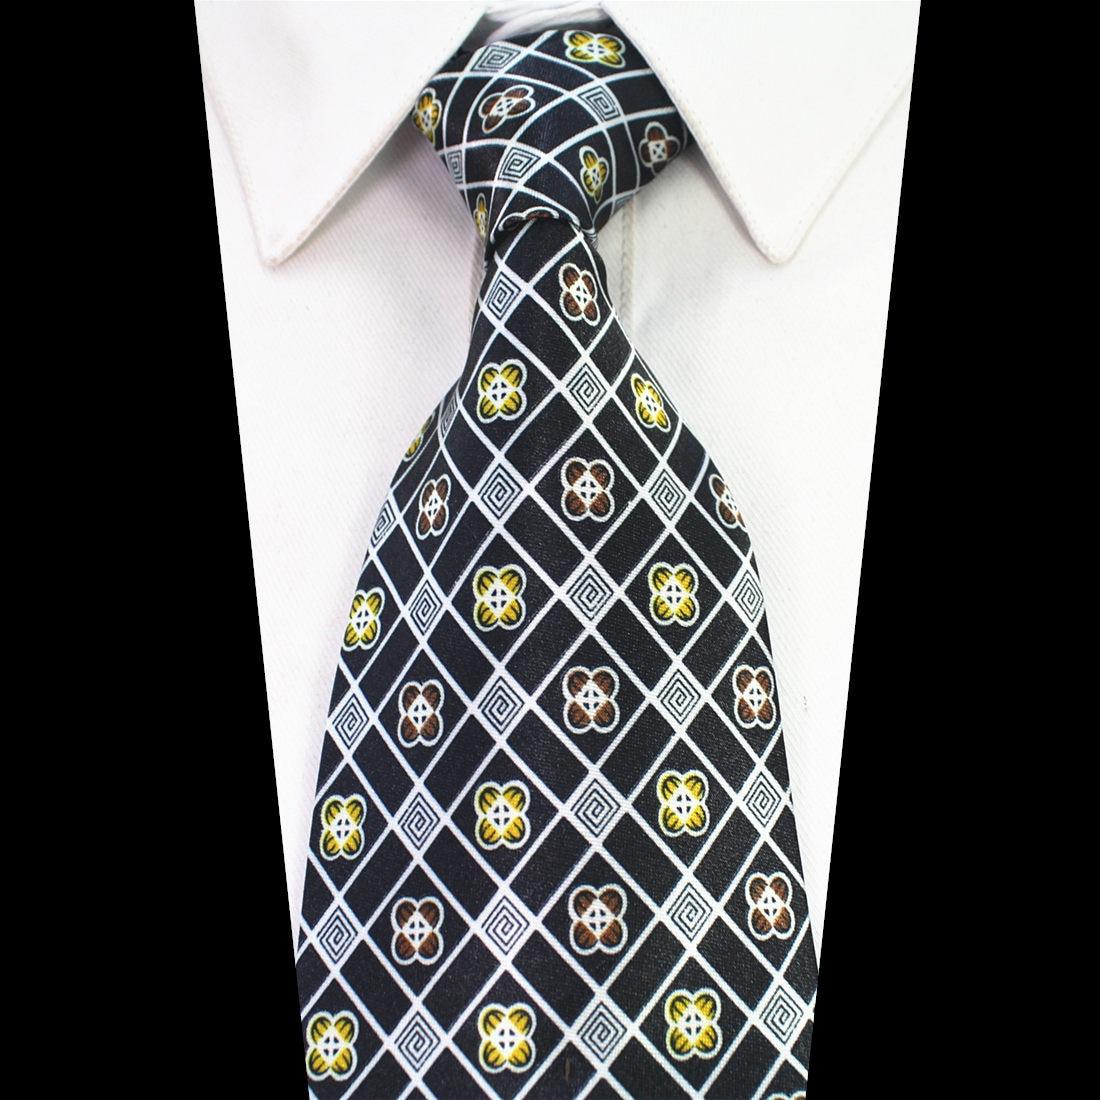 (2 Teile/paket) 10 Cm Herren Blumen Krawatten Formale Partei Geometrische Businss Krawatten E0629-005